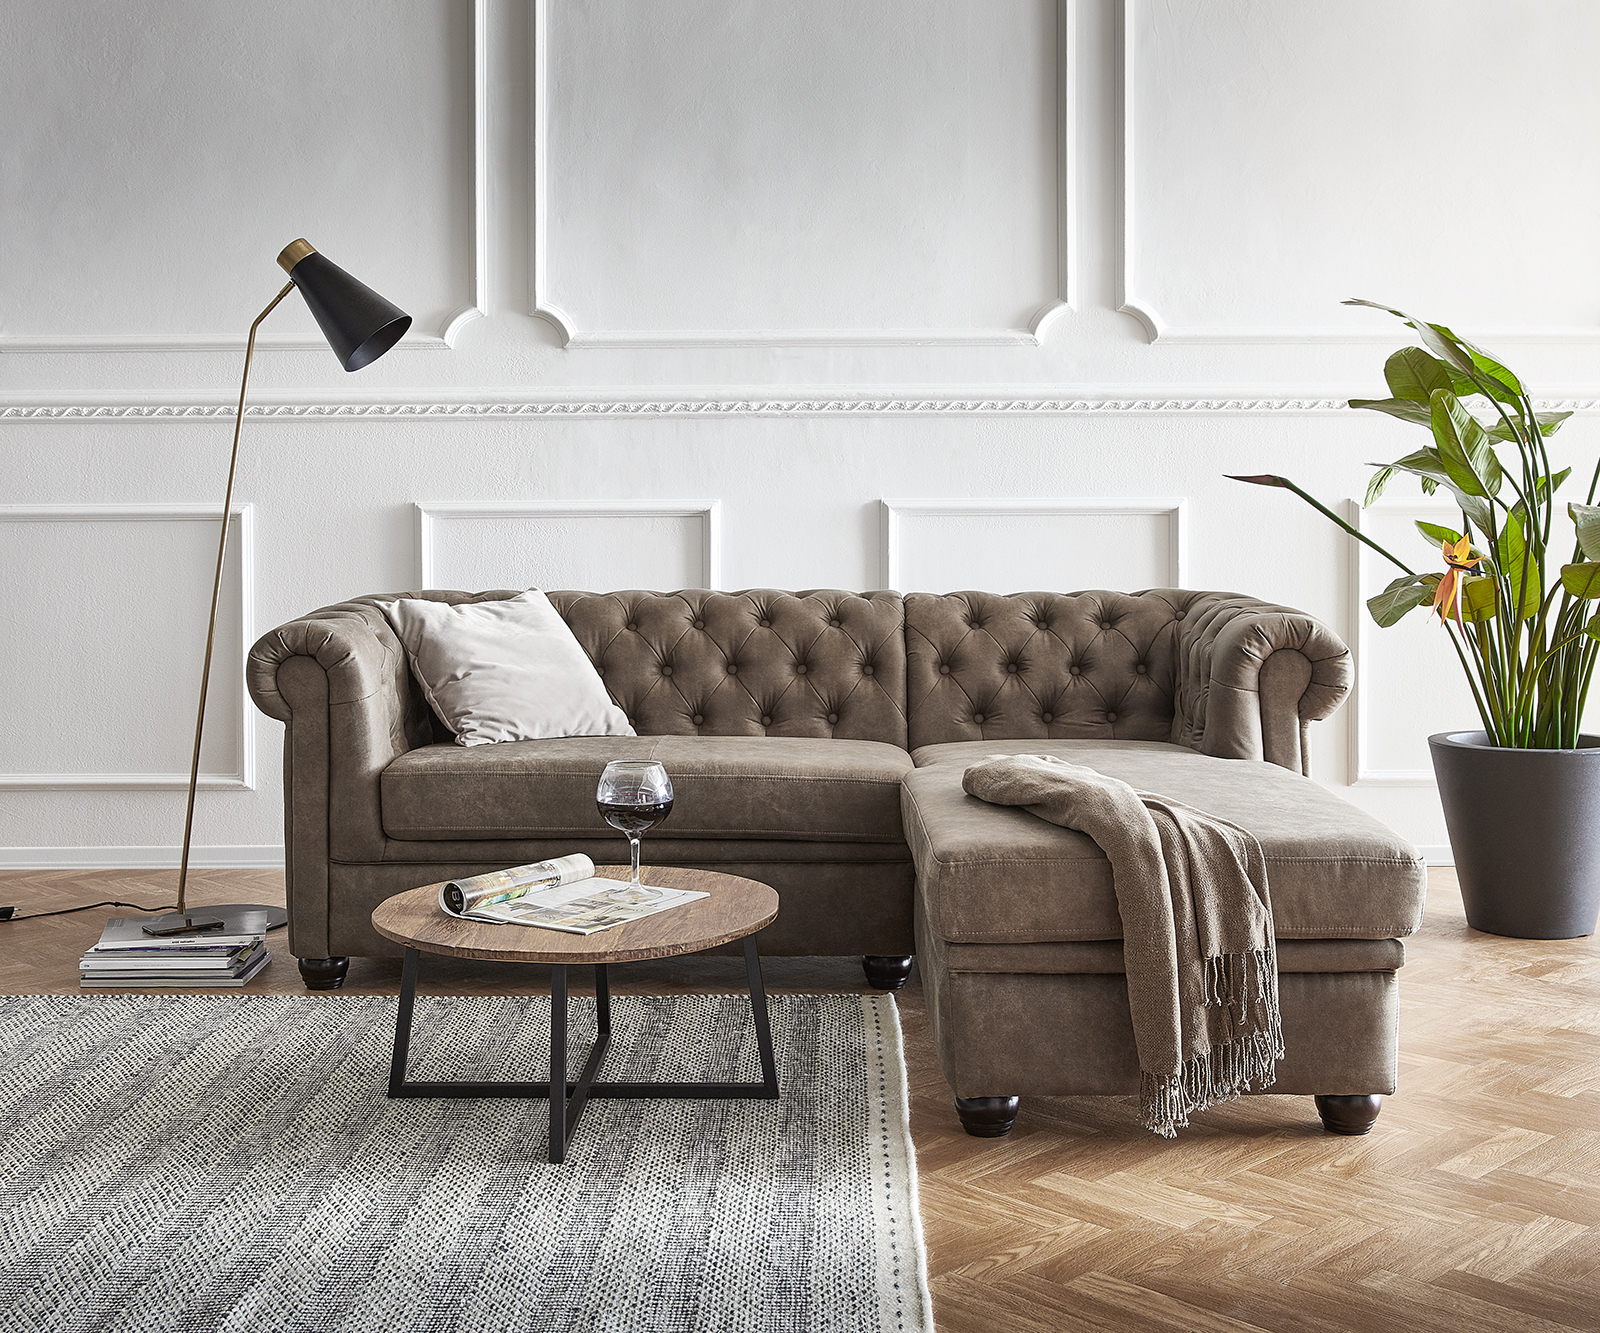 Sofa Chesterfield 200x88 cm Taupe Abgesteppt Ottomane Rechts